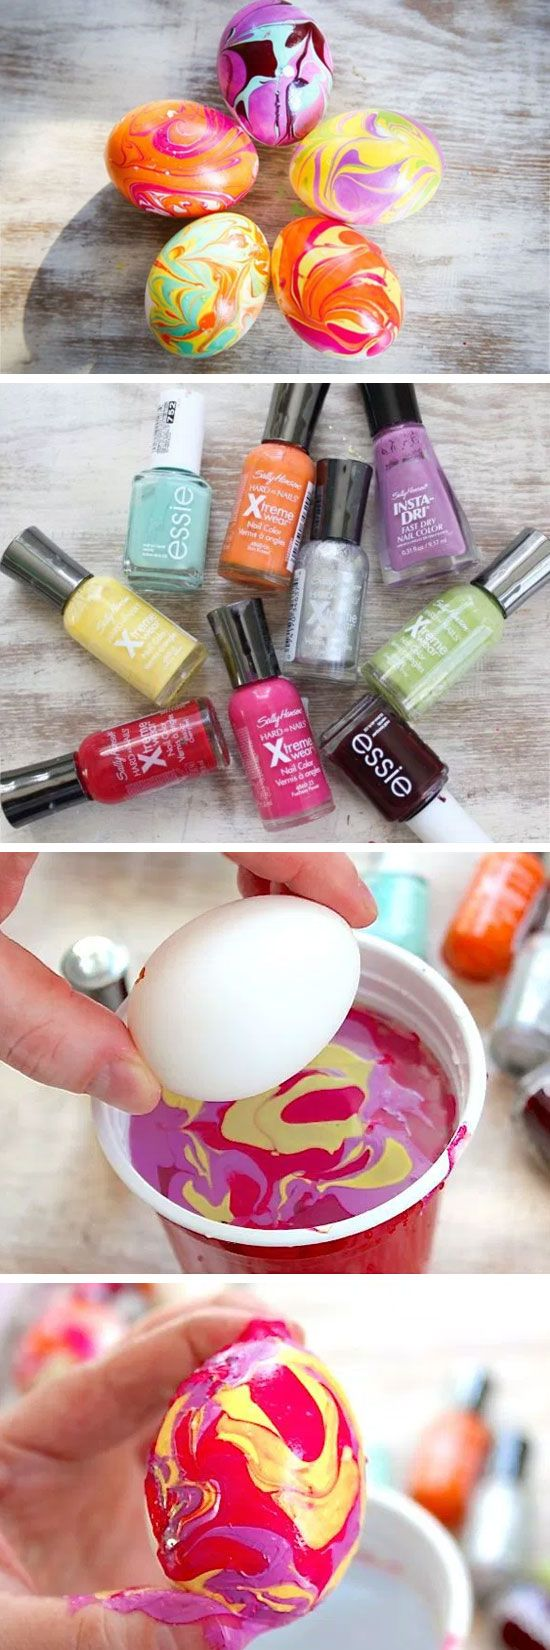 DIY Nail Polish Marbled Eggs | Easy Easter Egg Crafts for Kids